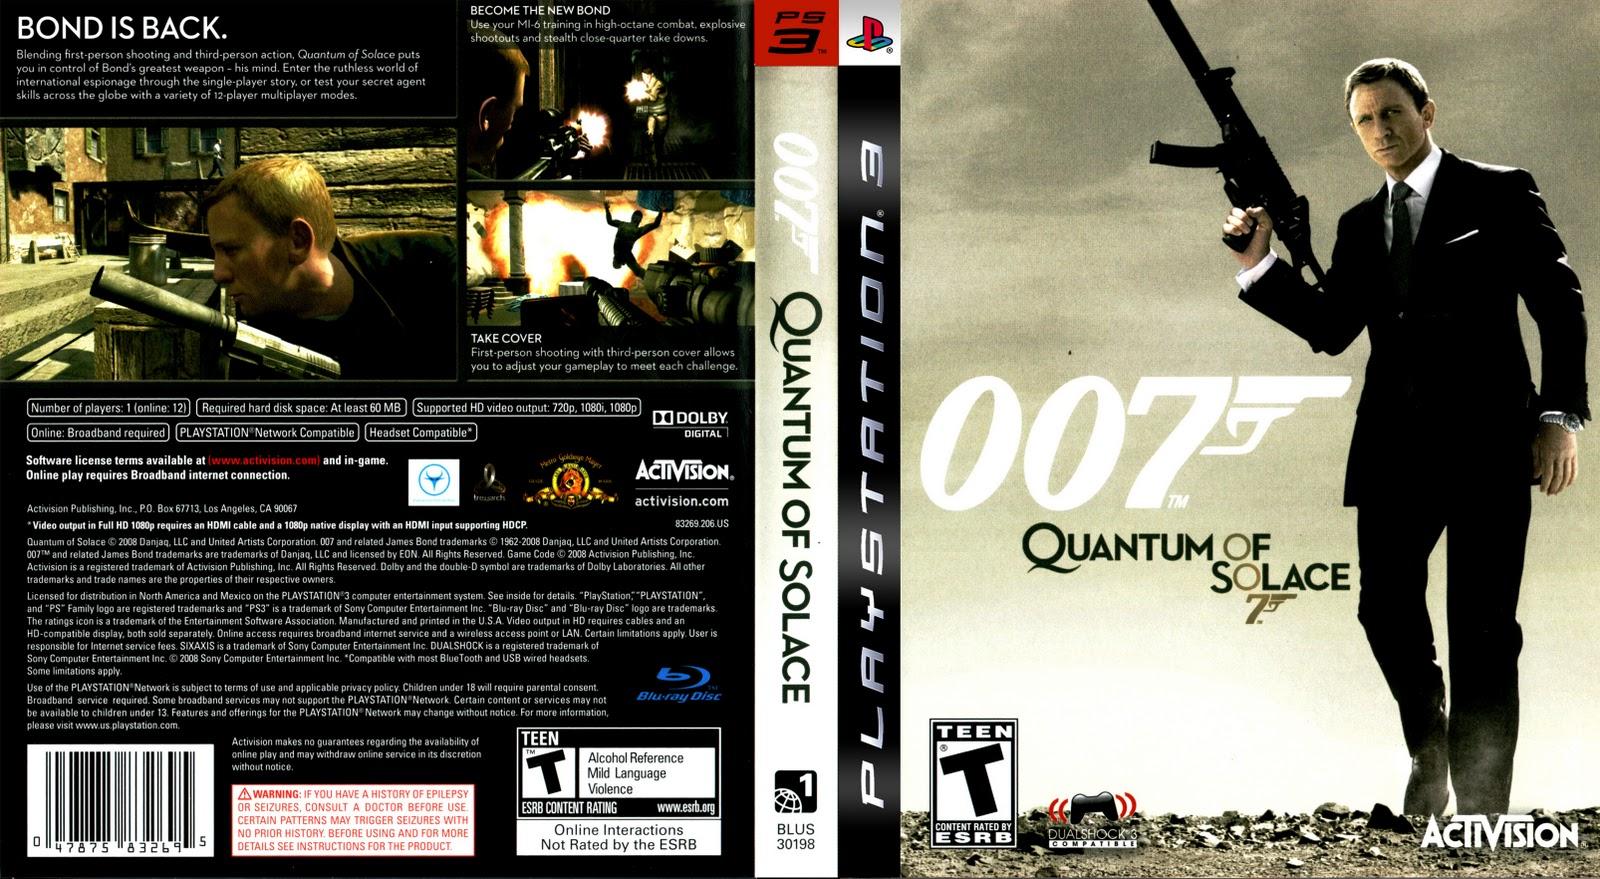 James Bond 007 Quantum of Solace PC Free Download